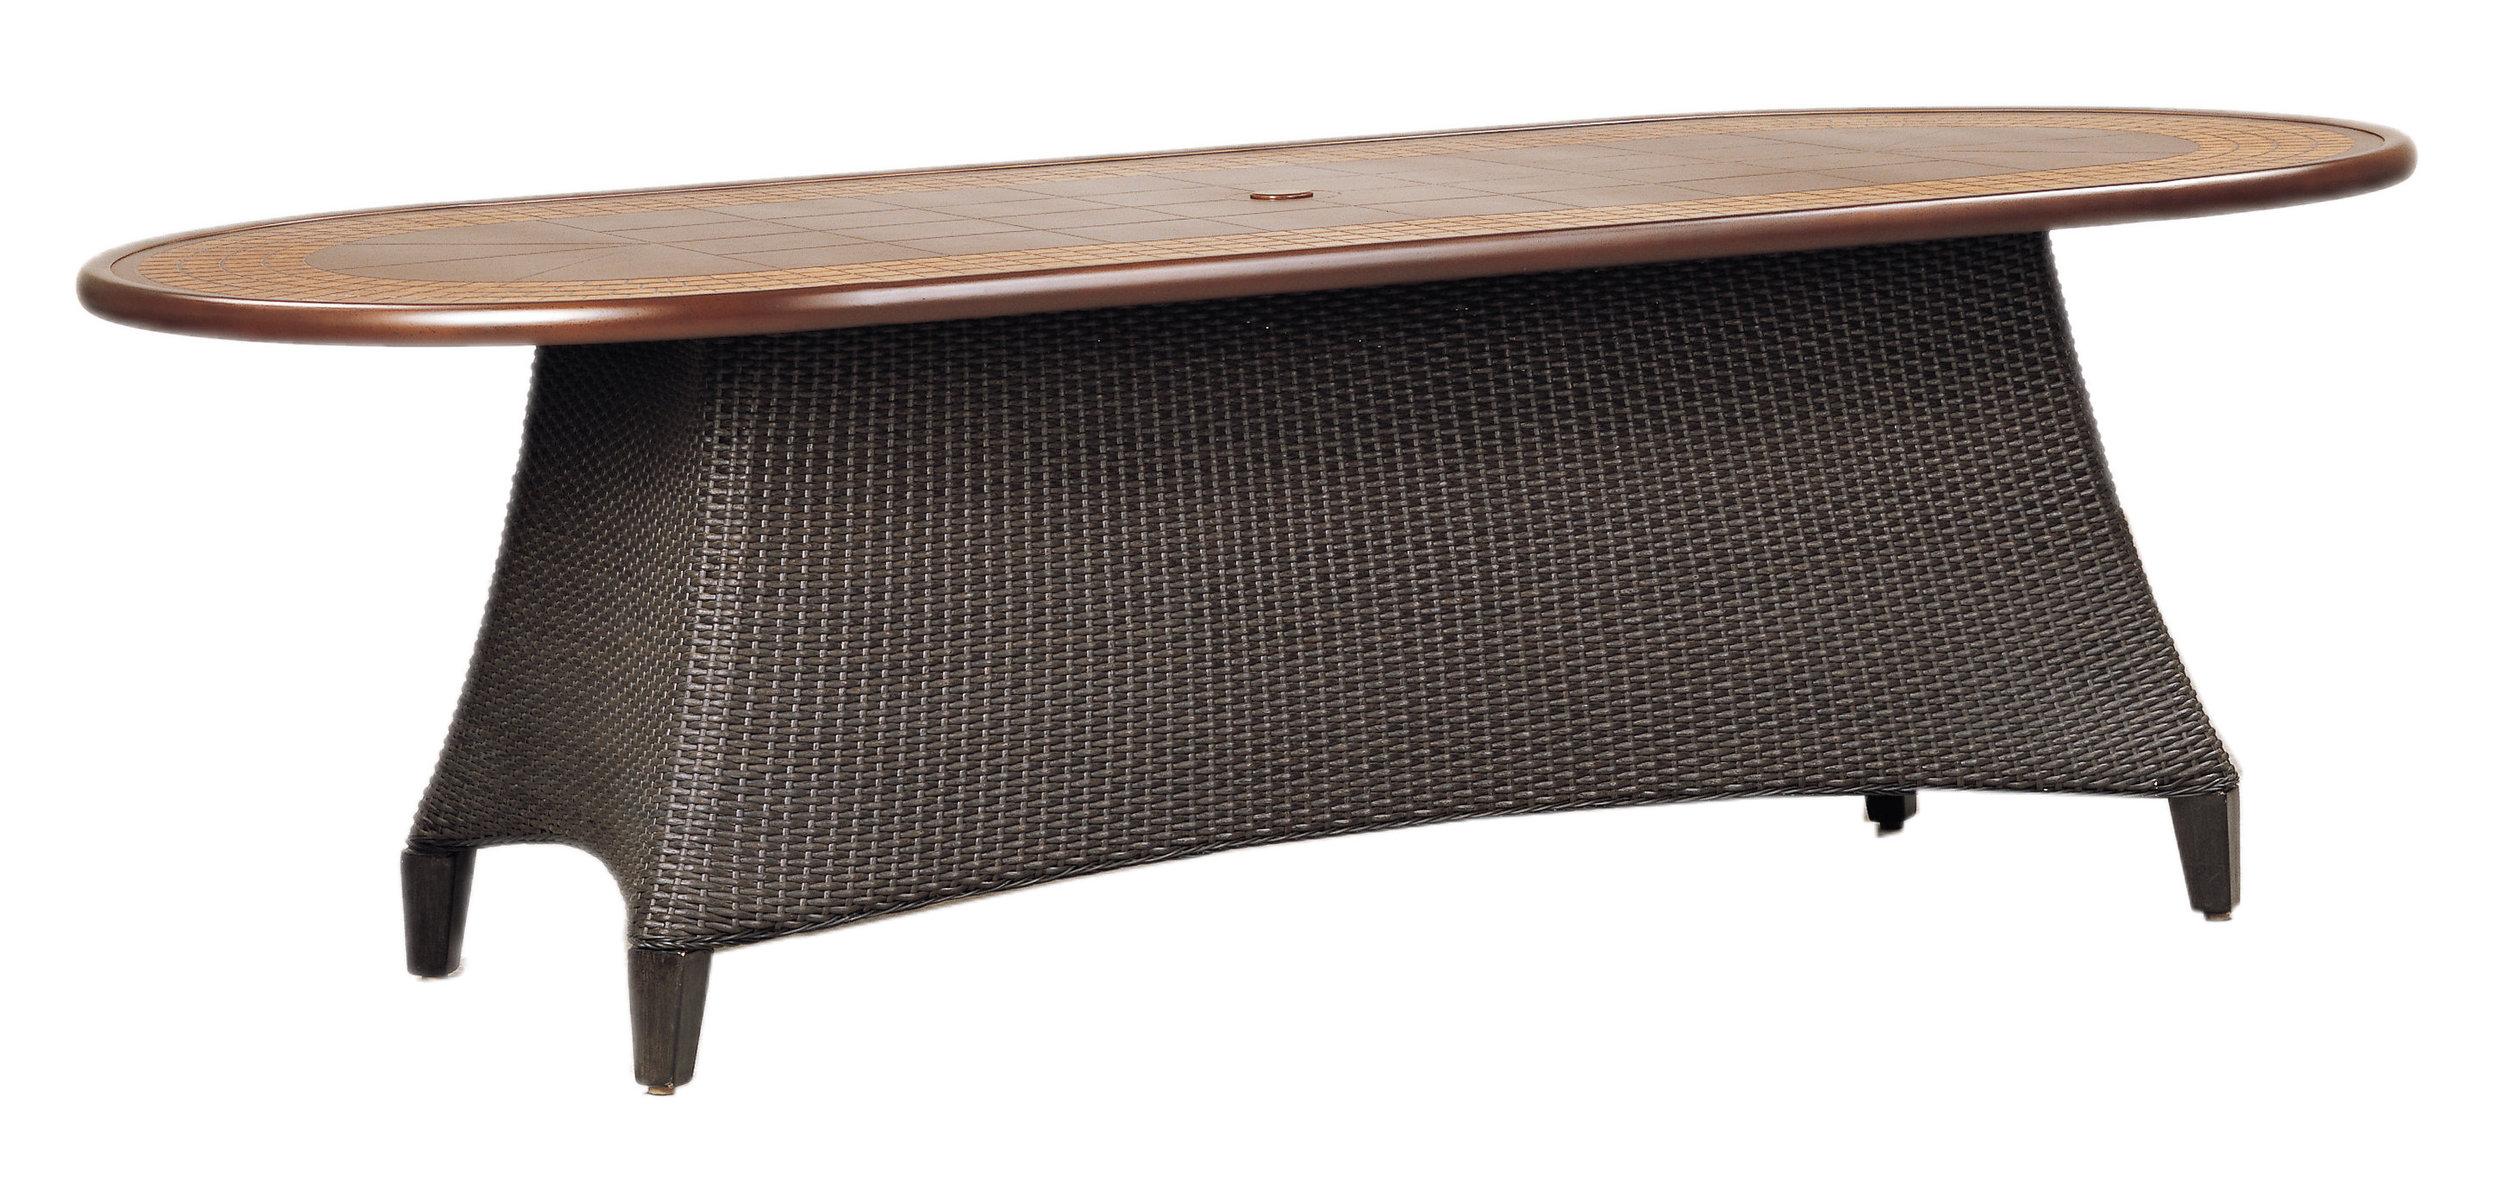 "970192B Monterey 92"" Dining Table Base   (top : CS-4276 Grandeur Aluminum Faux Stone Top)  28.8"" x 63.8"" x 27.5"""